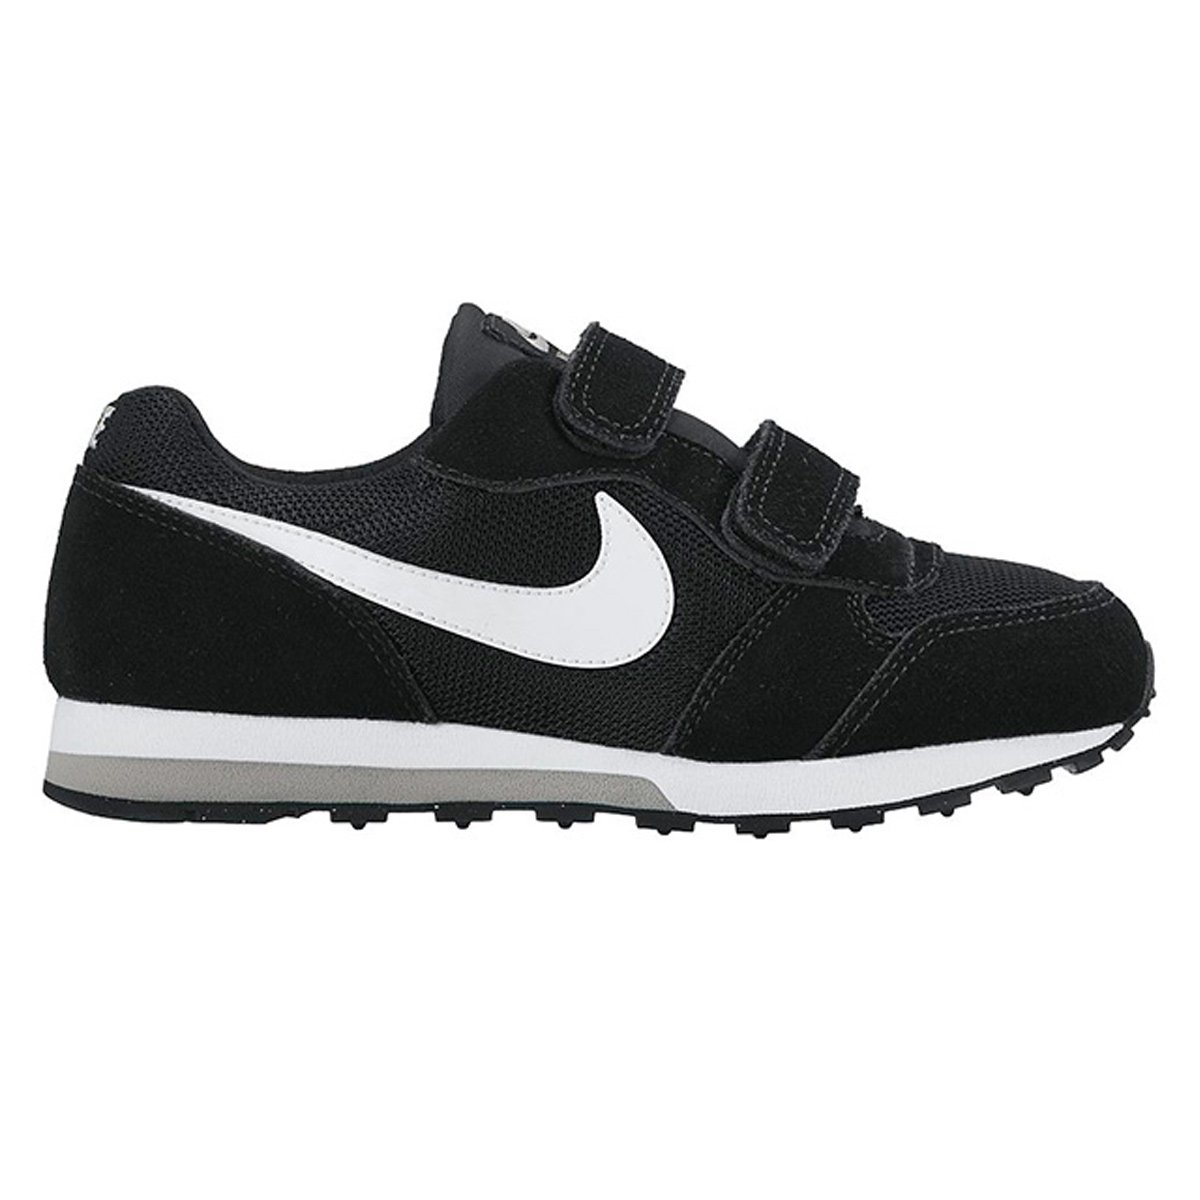 b36160a4d6f Tênis Infantil Nike Md Runner 2 - Preto e Cinza - Compre Agora ...